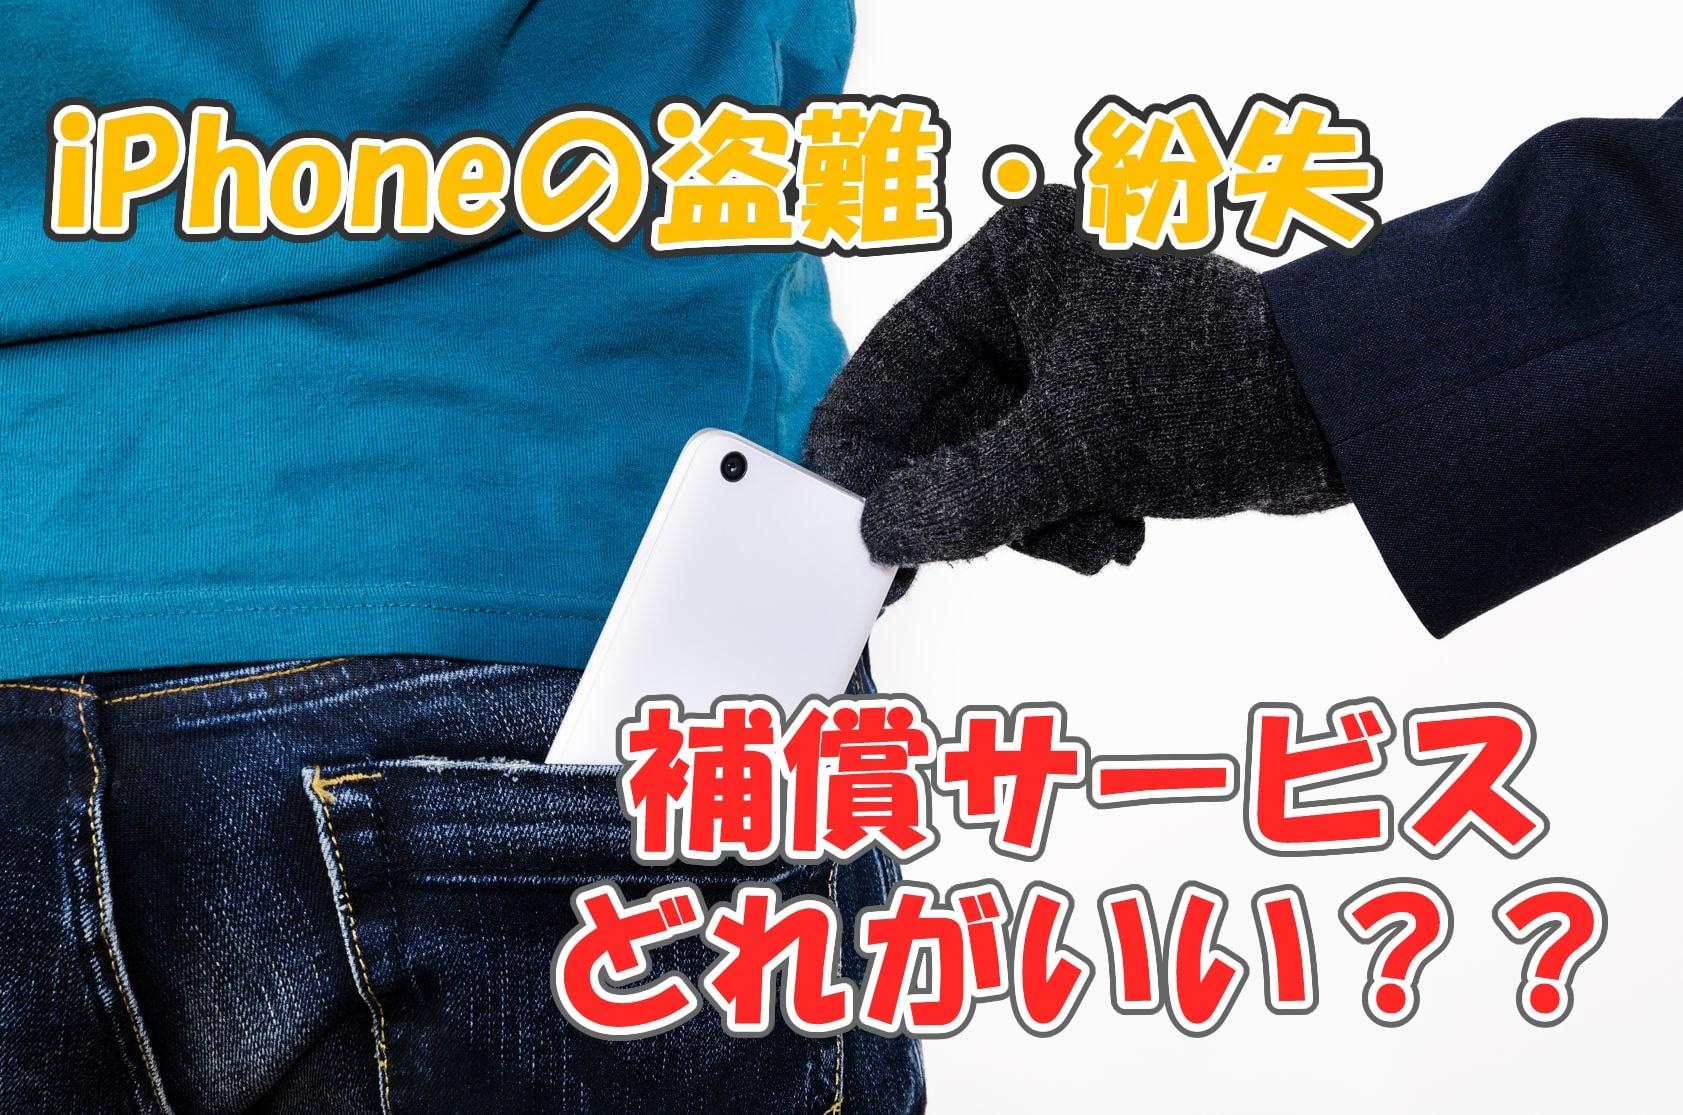 iPhoneの盗難や紛失の補償サービスはどれがいい?